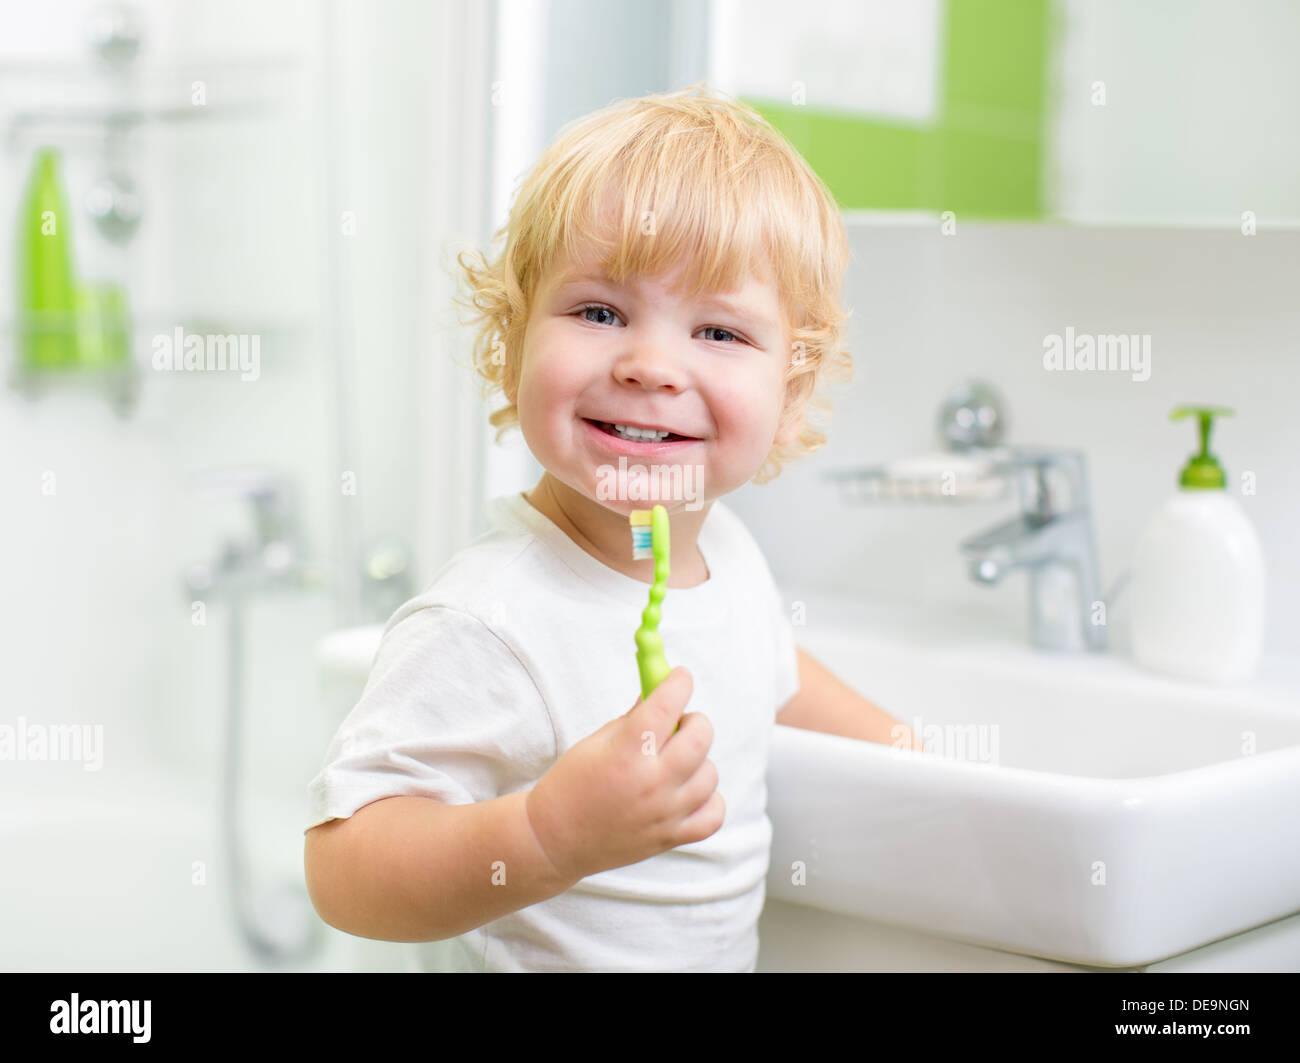 Happy kid or child brushing teeth in bathroom. Dental hygiene. Stock Photo